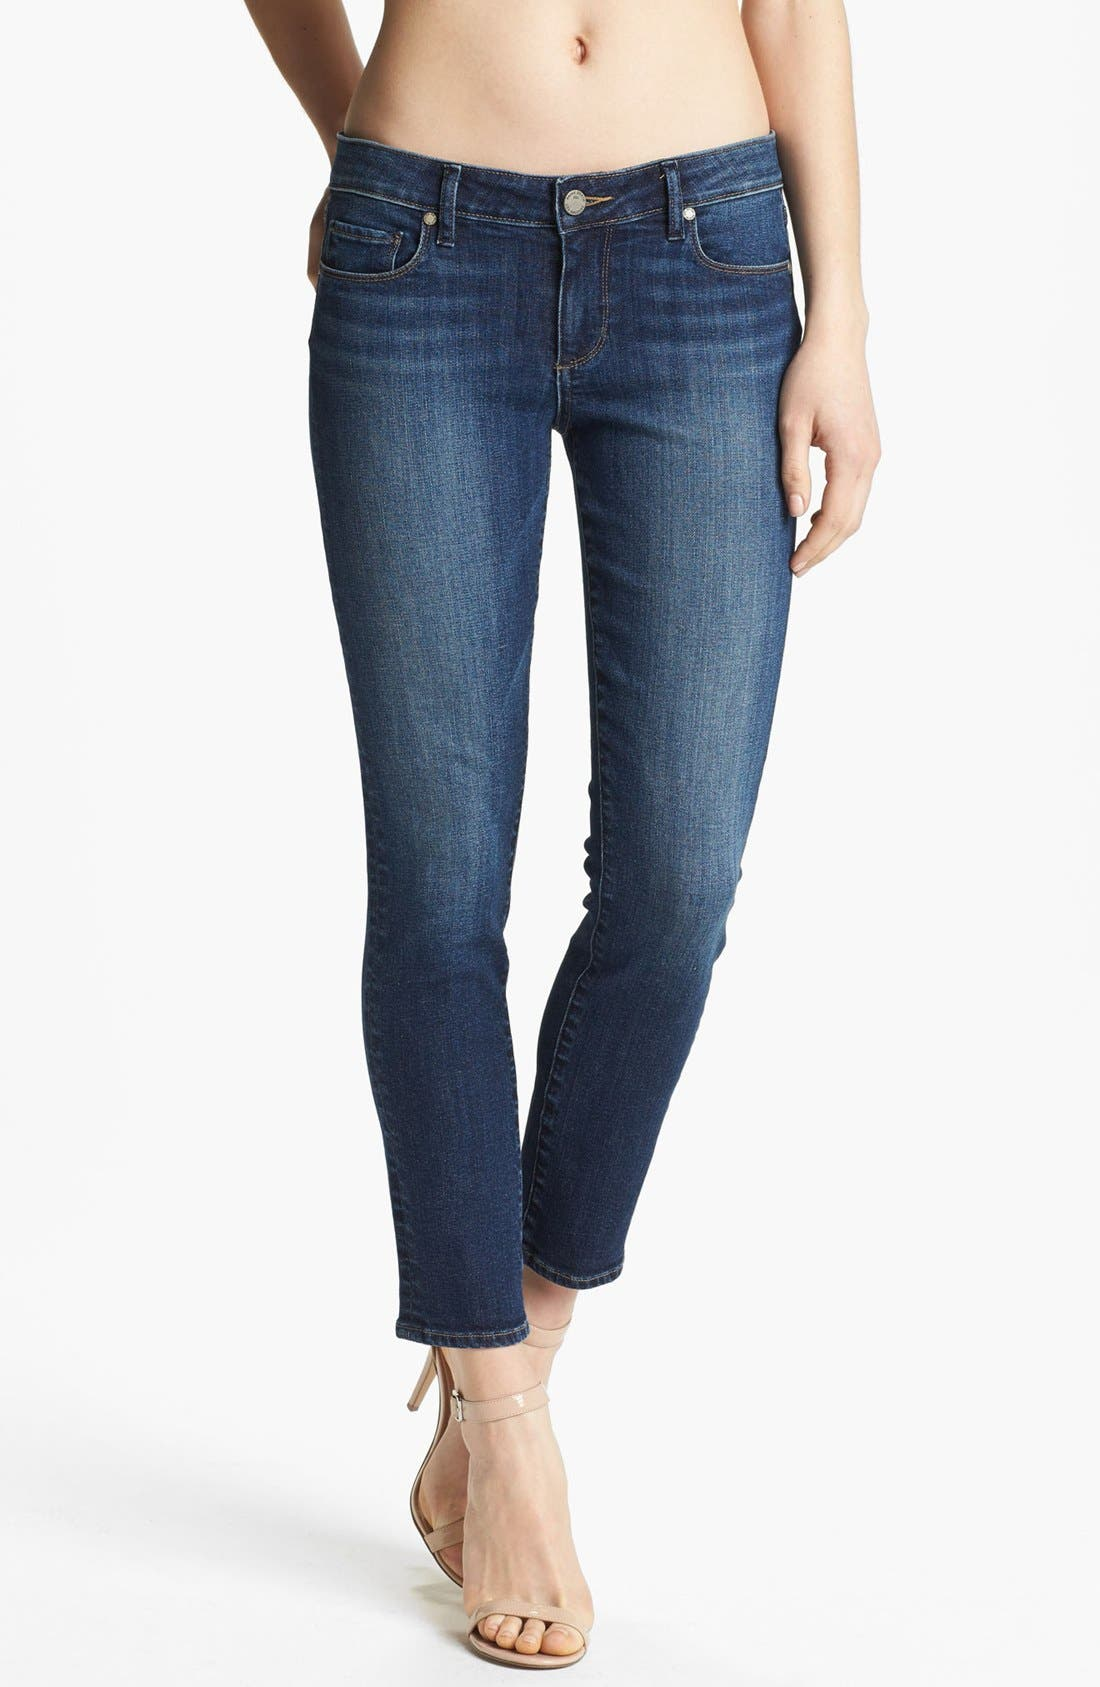 Alternate Image 1 Selected - Paige Denim 'Skyline' Ankle Jeans (Benny)